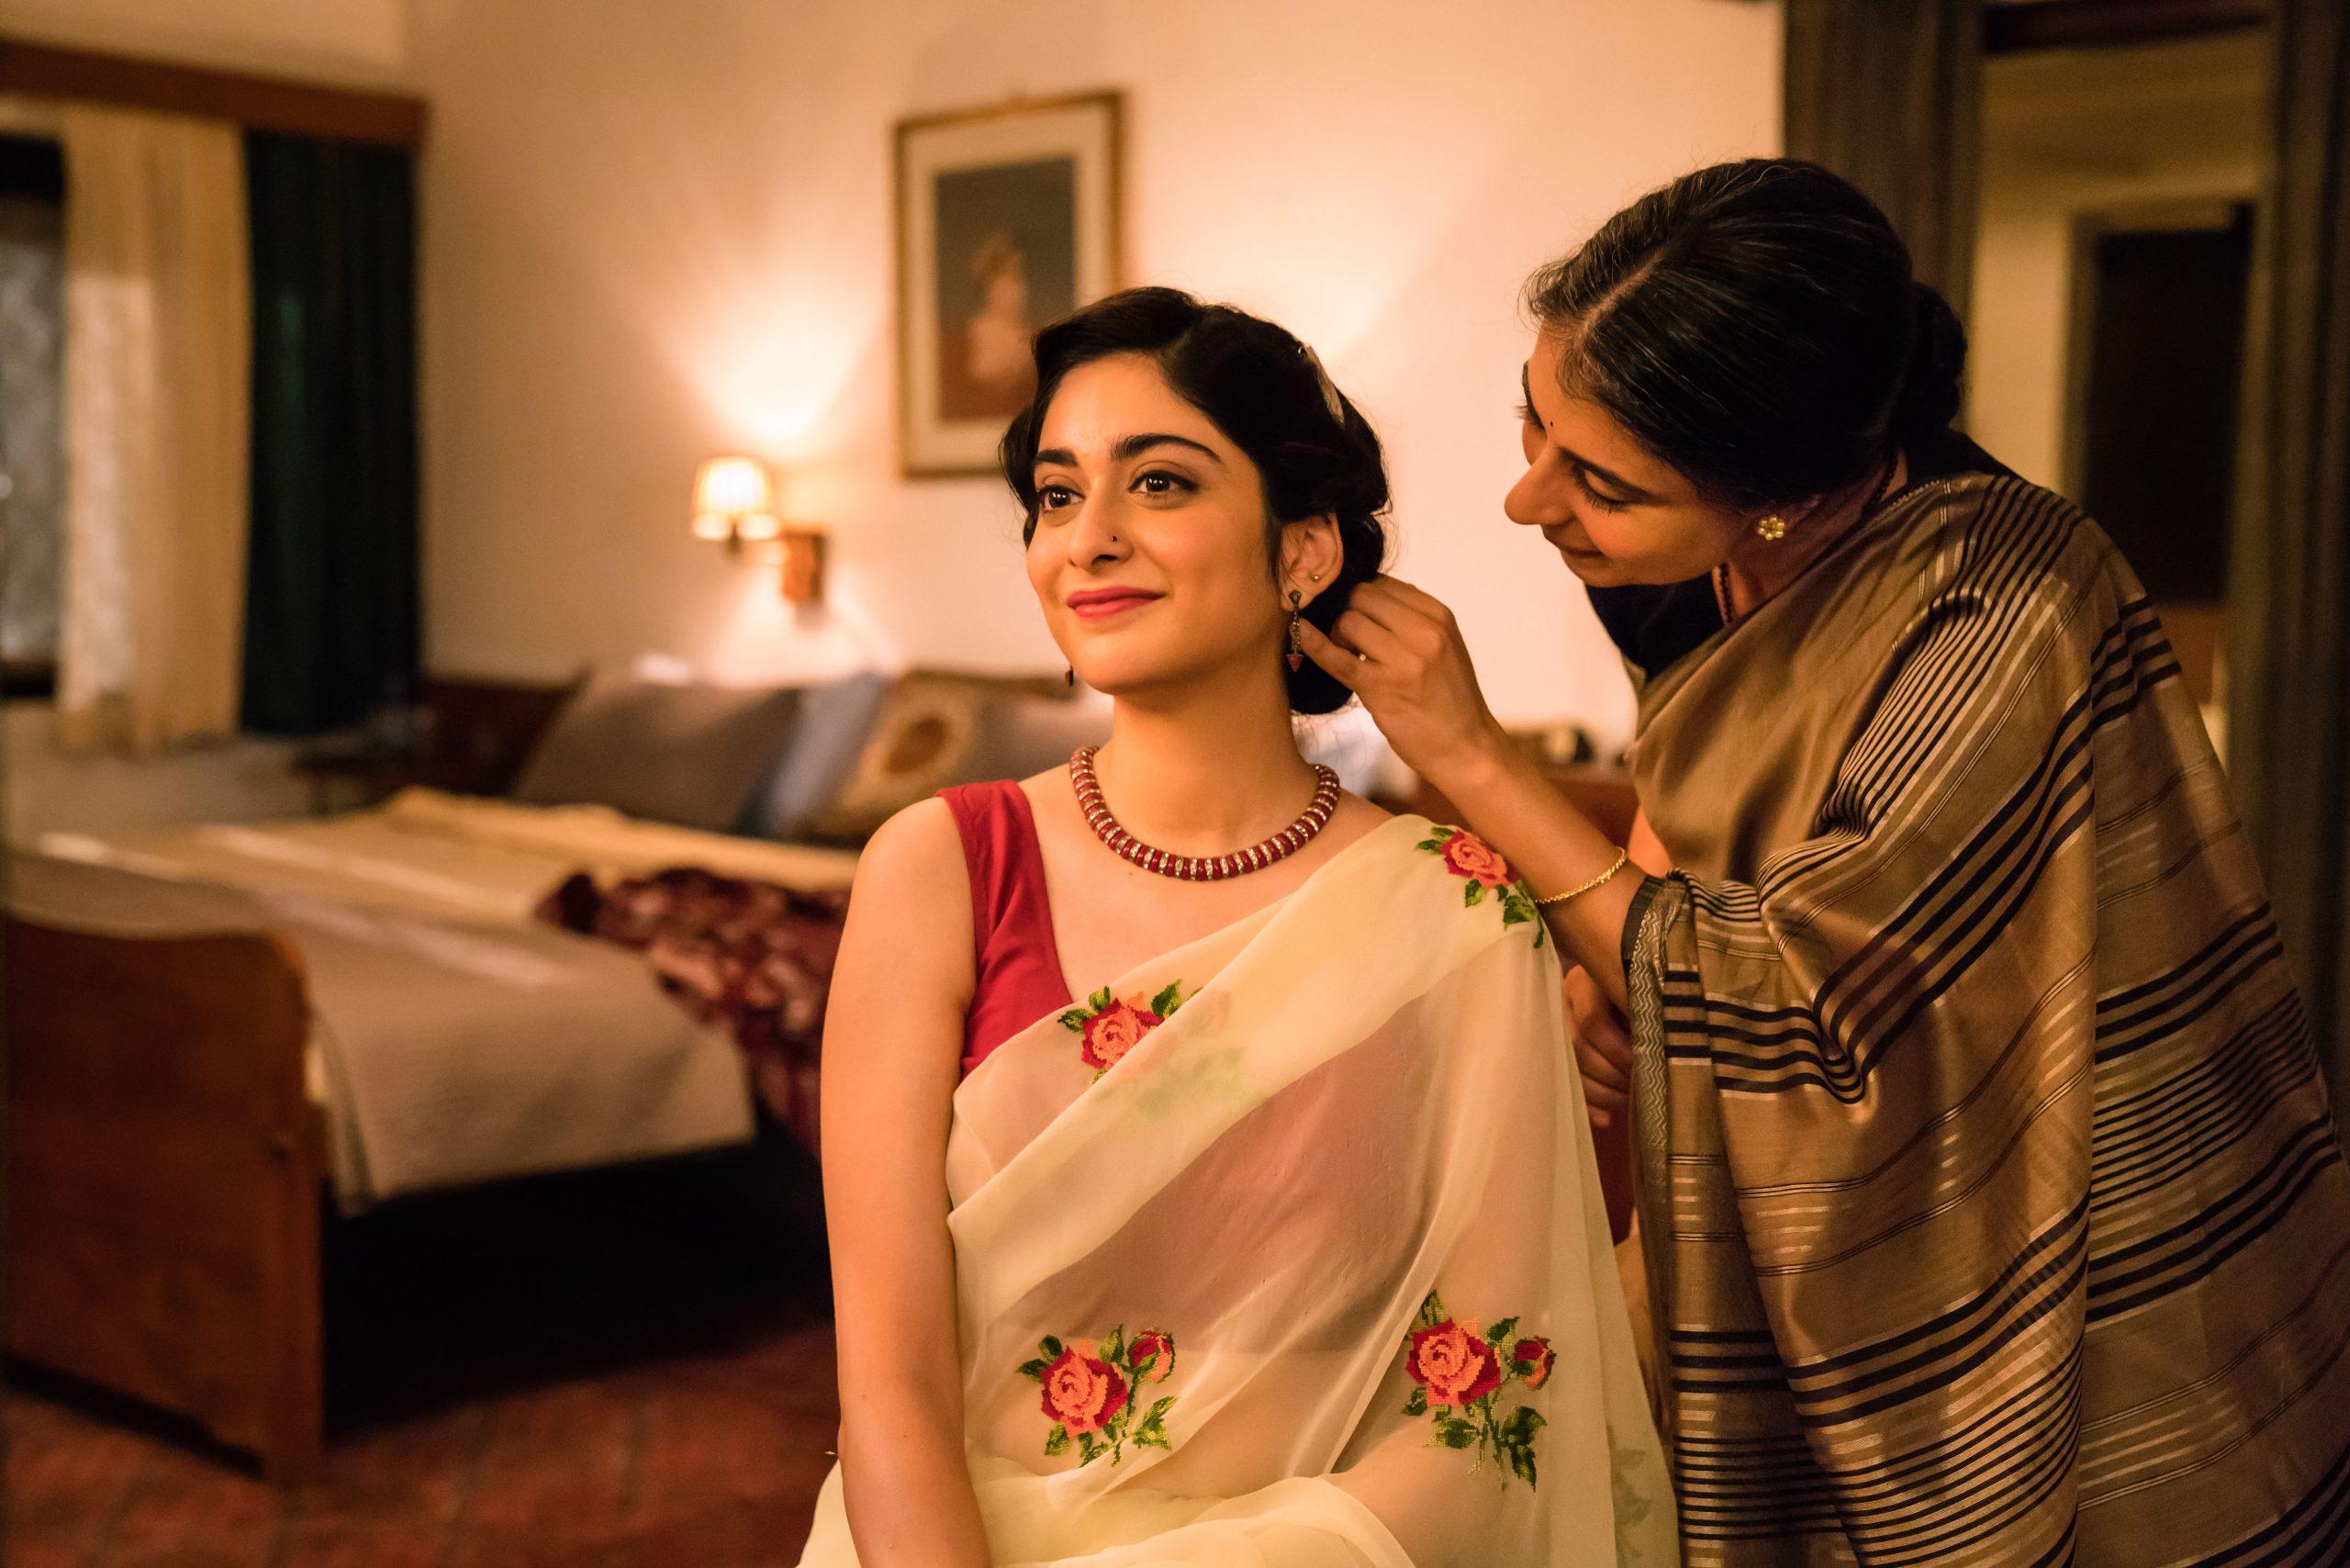 MASTERPIECE: Tanya Maniktala (left) and Mahira Kakkar in TV series A Suitable Boy (Photo: Supriya Kantak/BBC/Lookout Point)